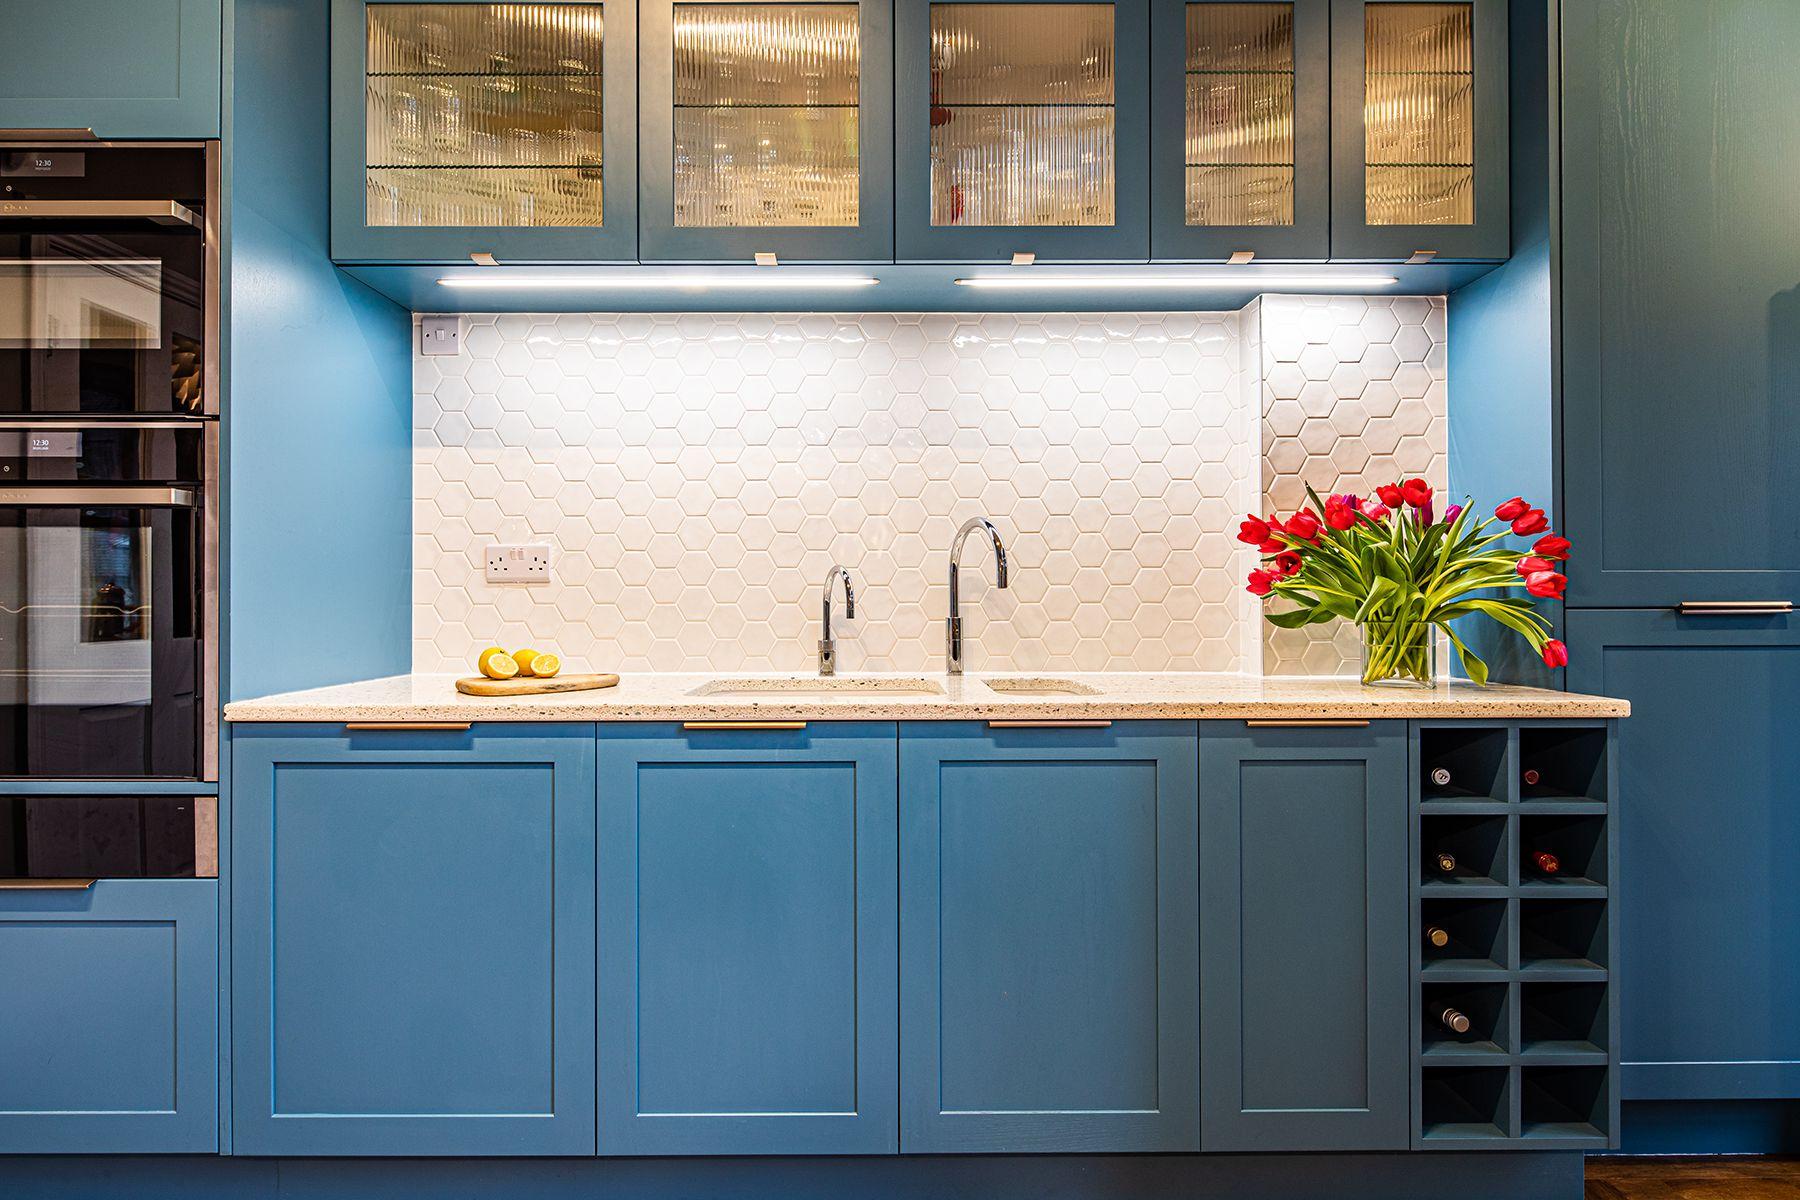 Blue Shaker Kitchen Cabinet Inspiration In 2020 Kitchen Cabinet Inspiration Blue Kitchen Cabinets Shaker Kitchen Cabinets